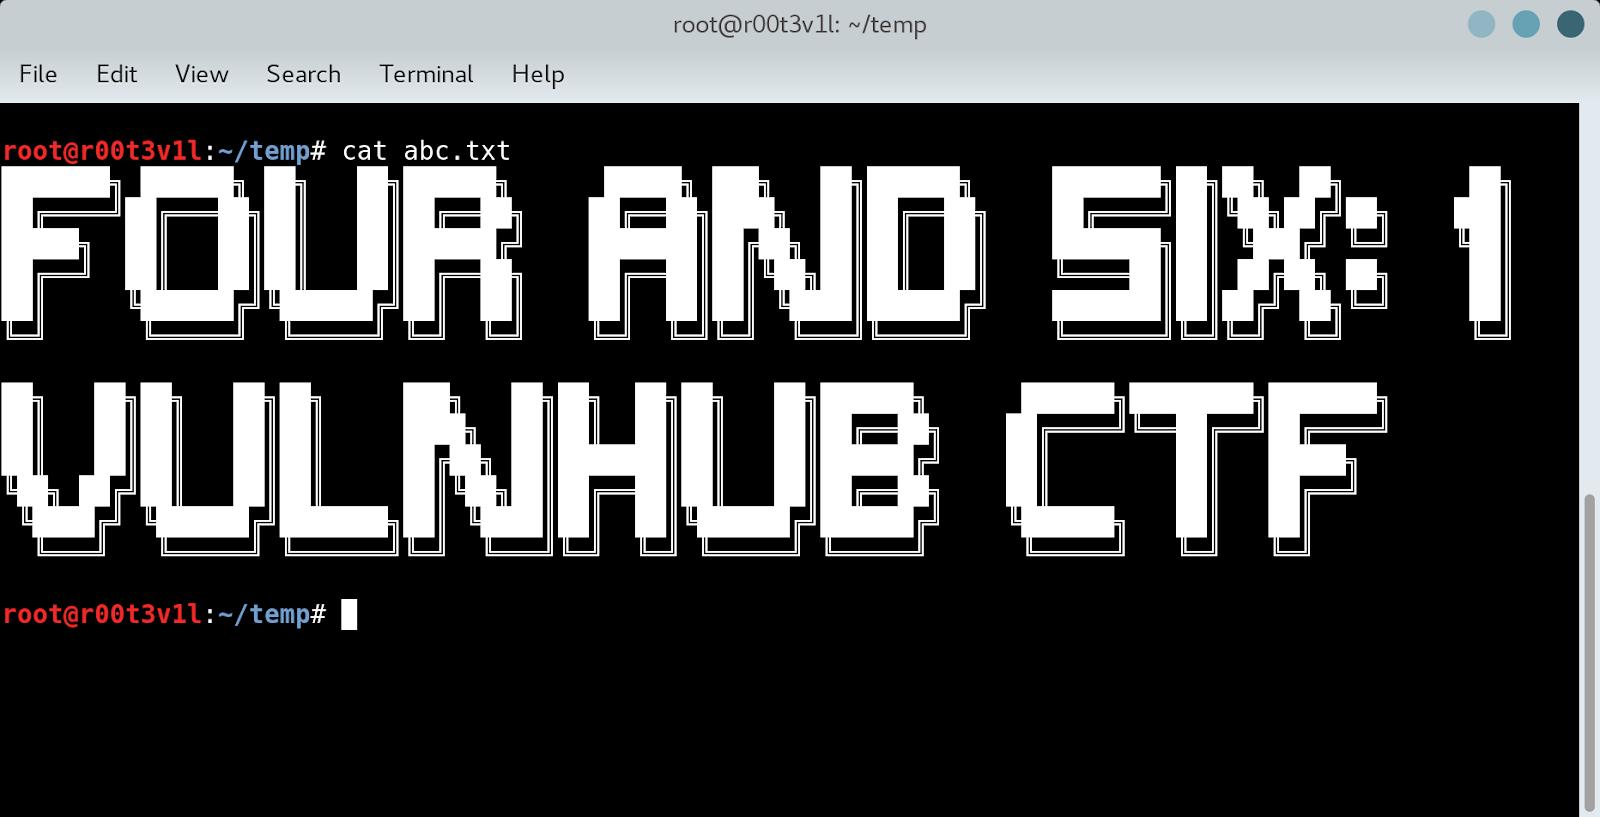 FourAndSix: 1 CTF VULNHUB Walkthrough/Writeup - The Hackers